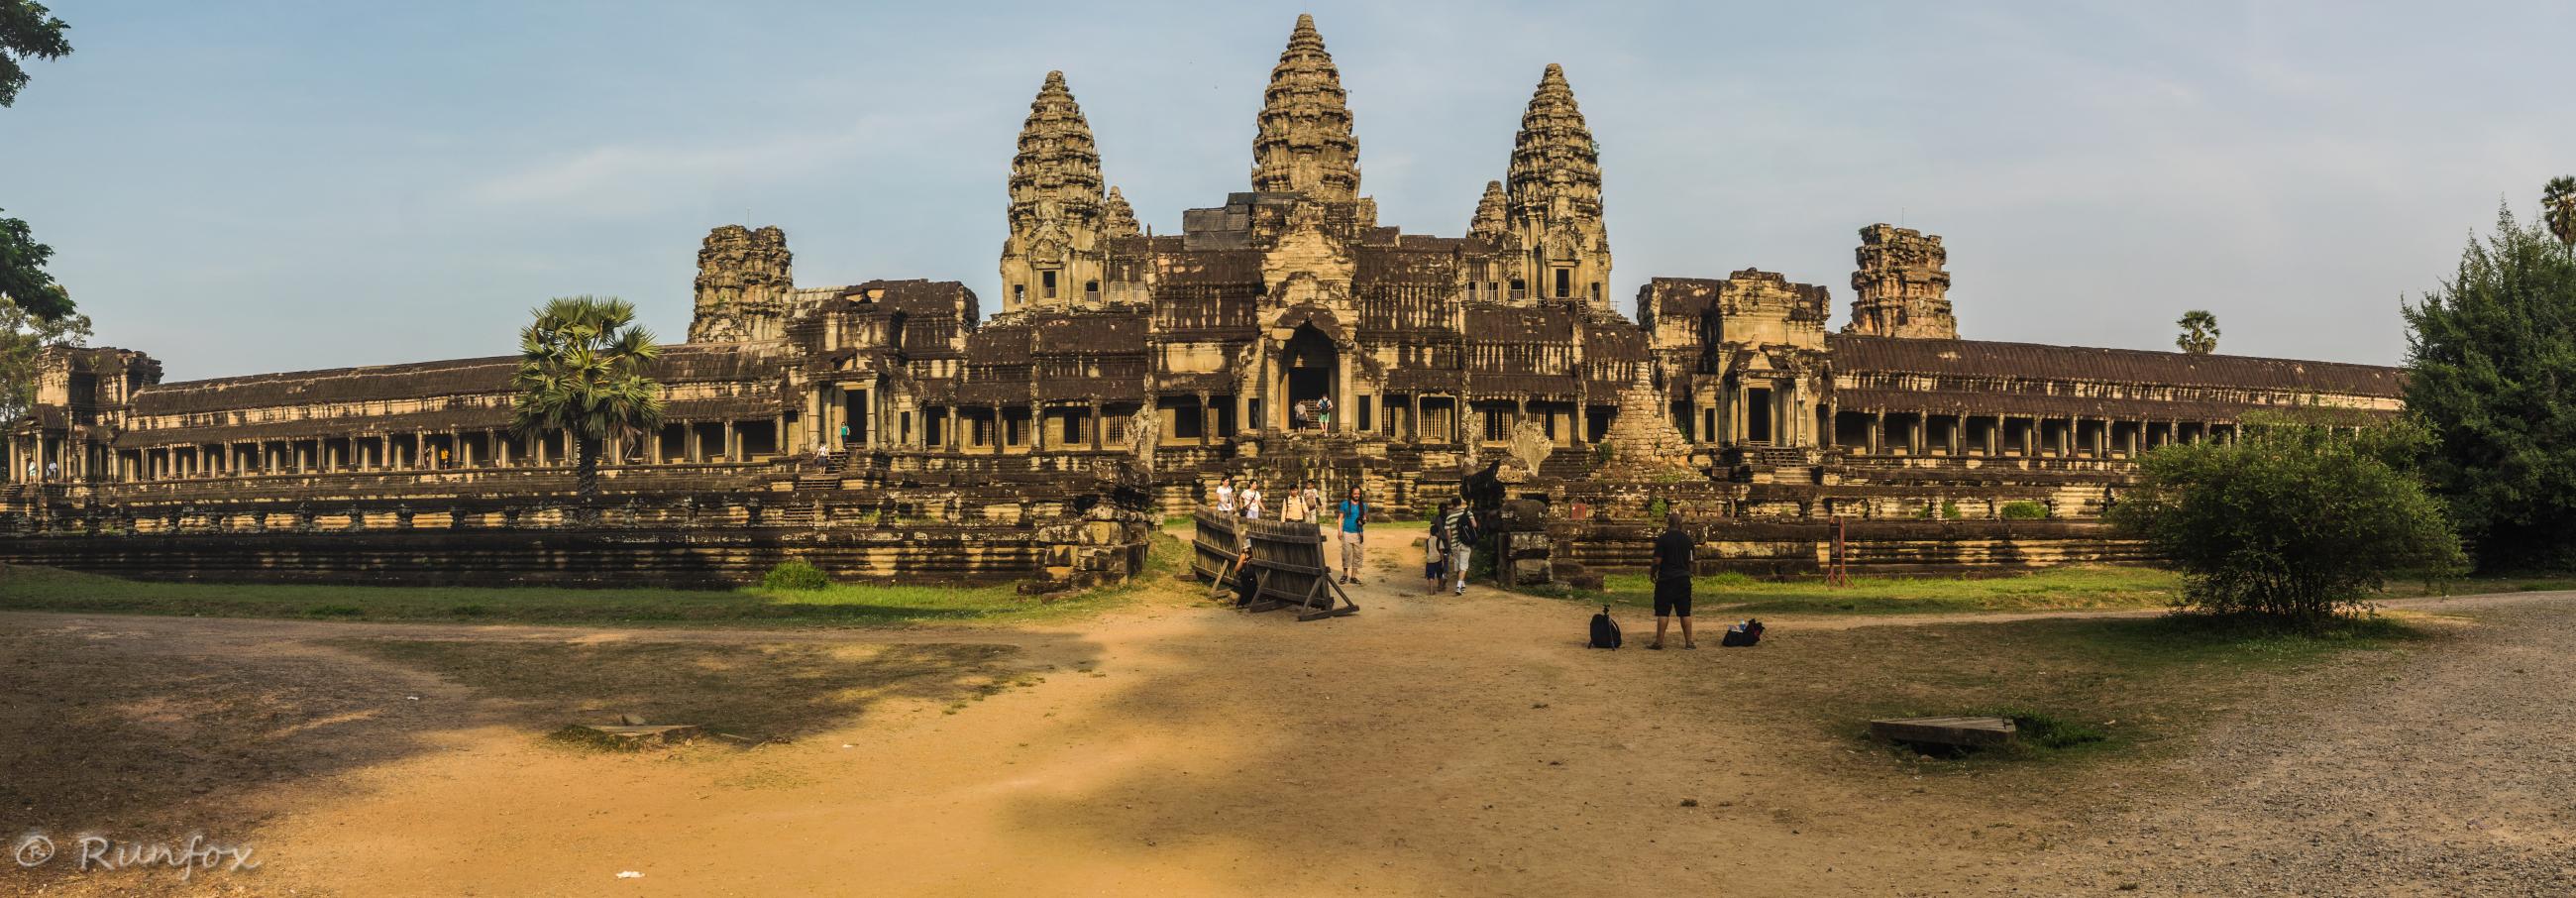 Cambodia by Runfox